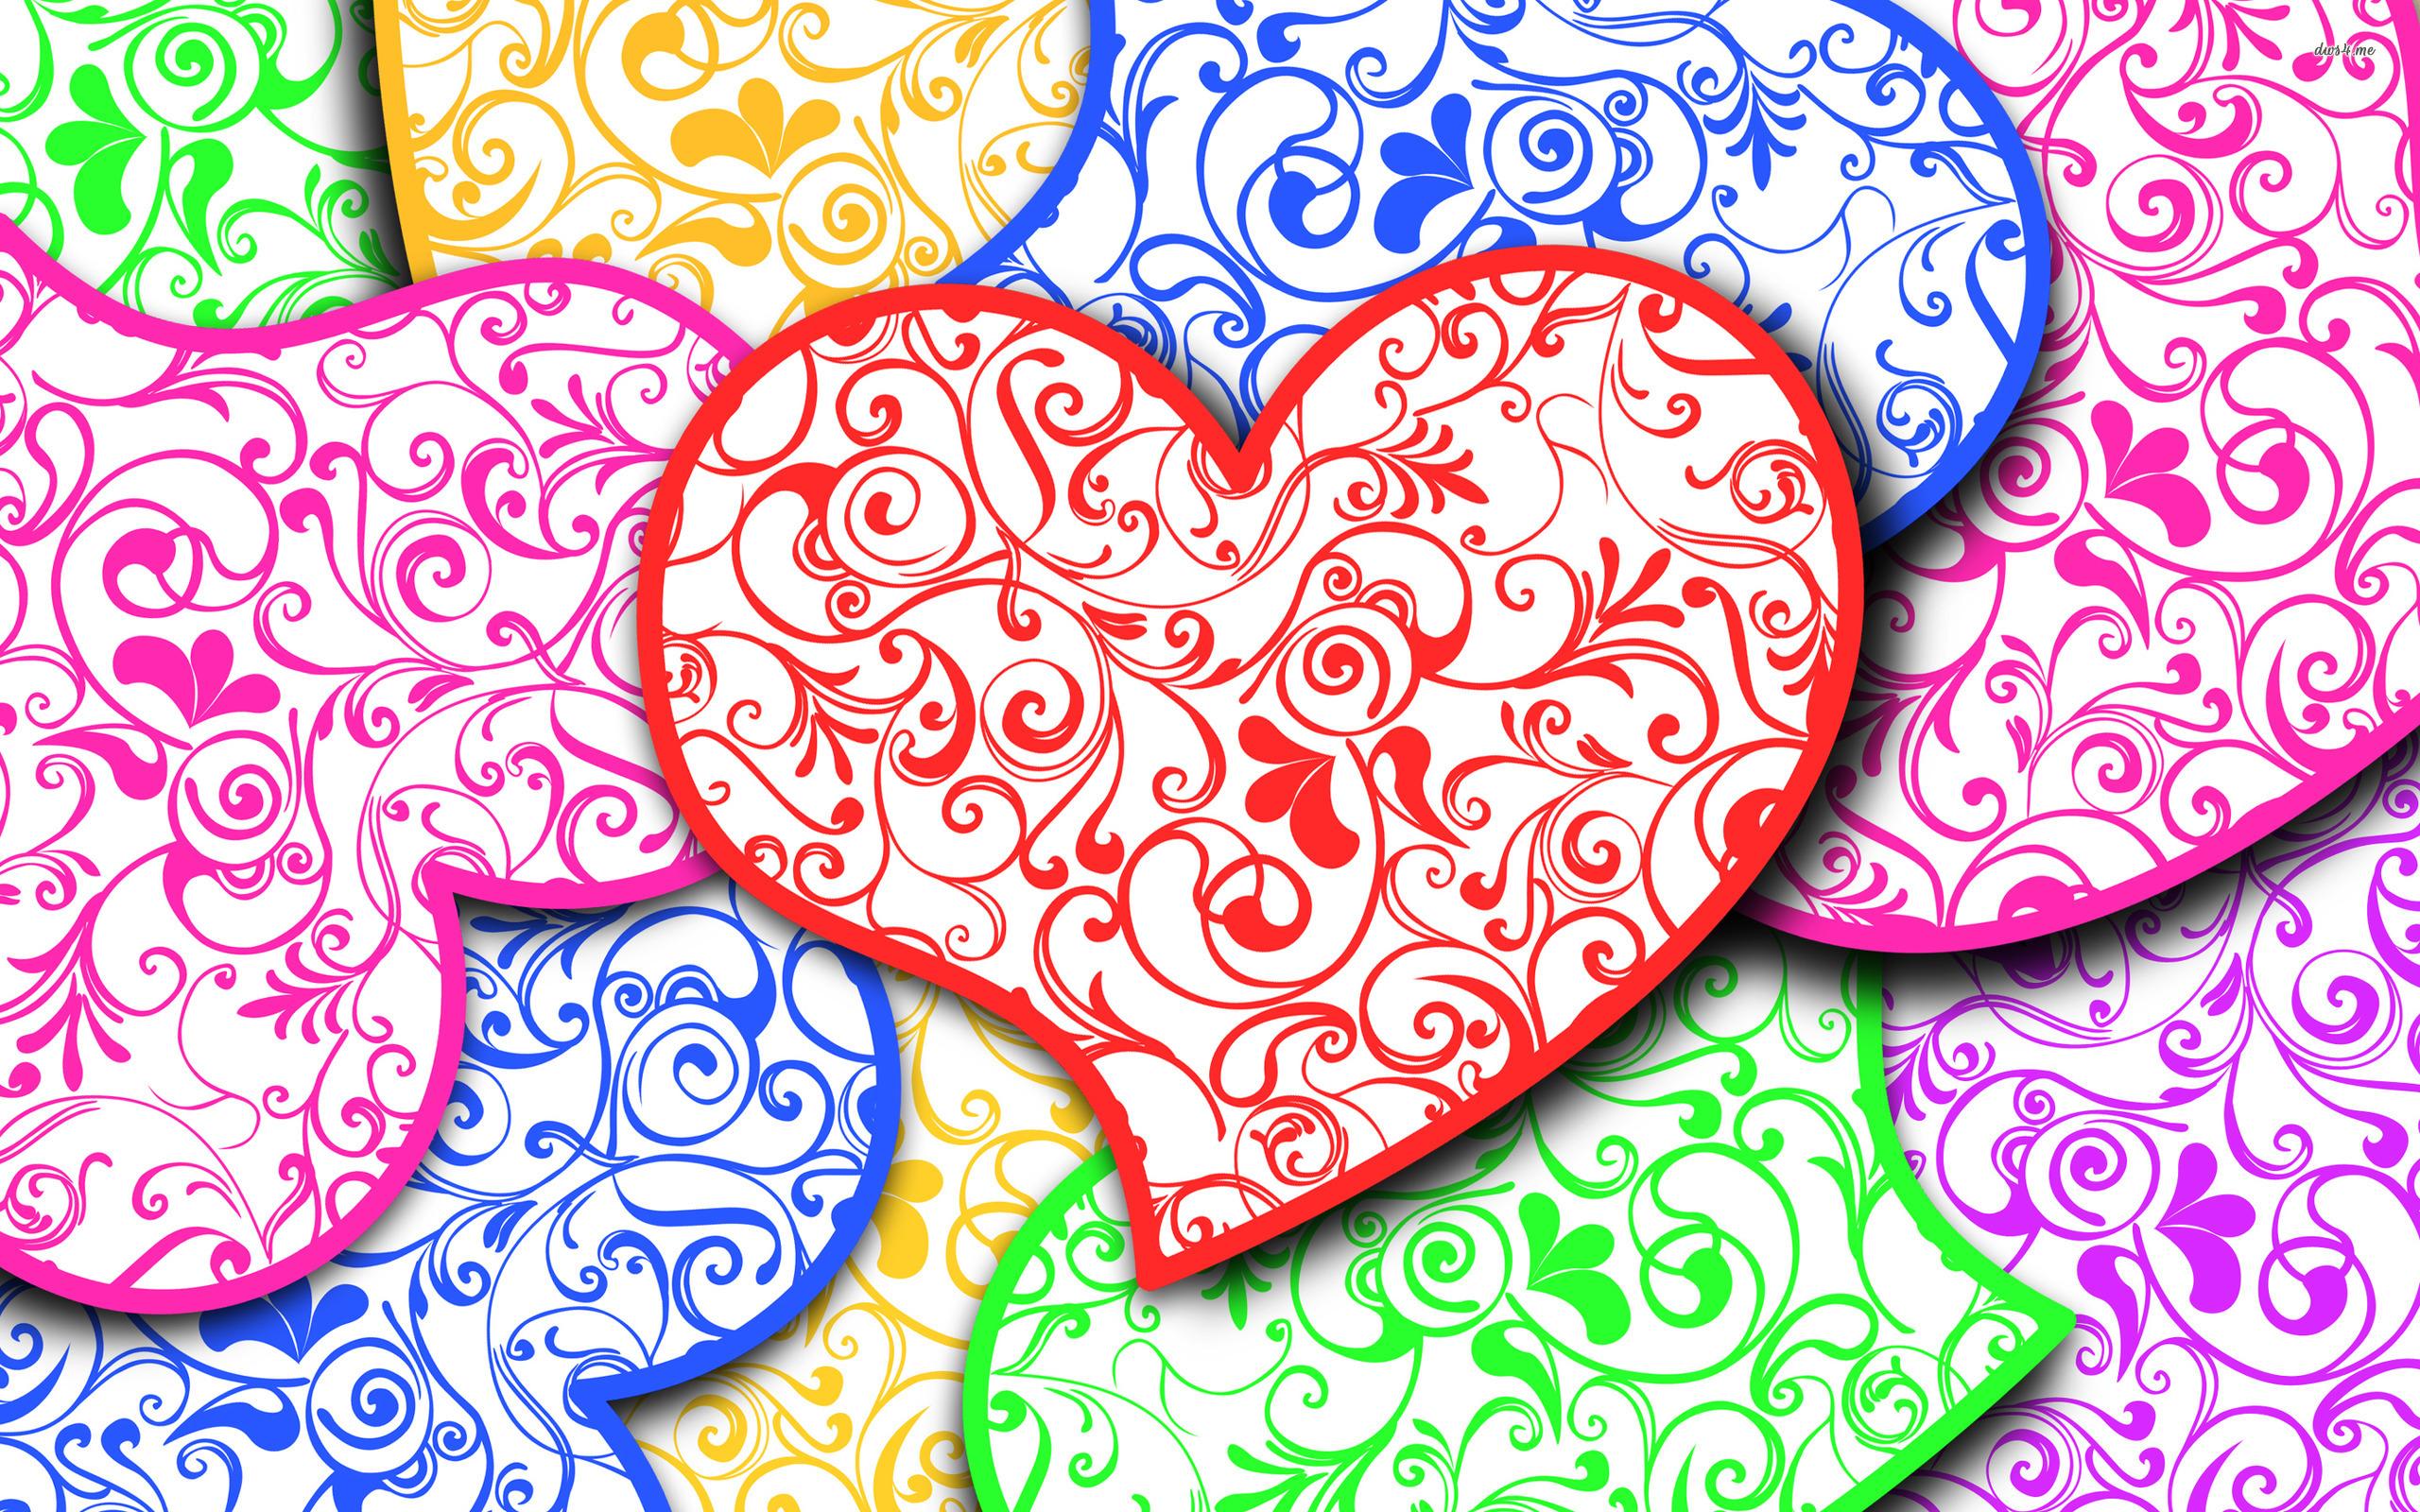 Fond D Ecran De Coeur Love Hd 148192 Hd Wallpaper Backgrounds Download